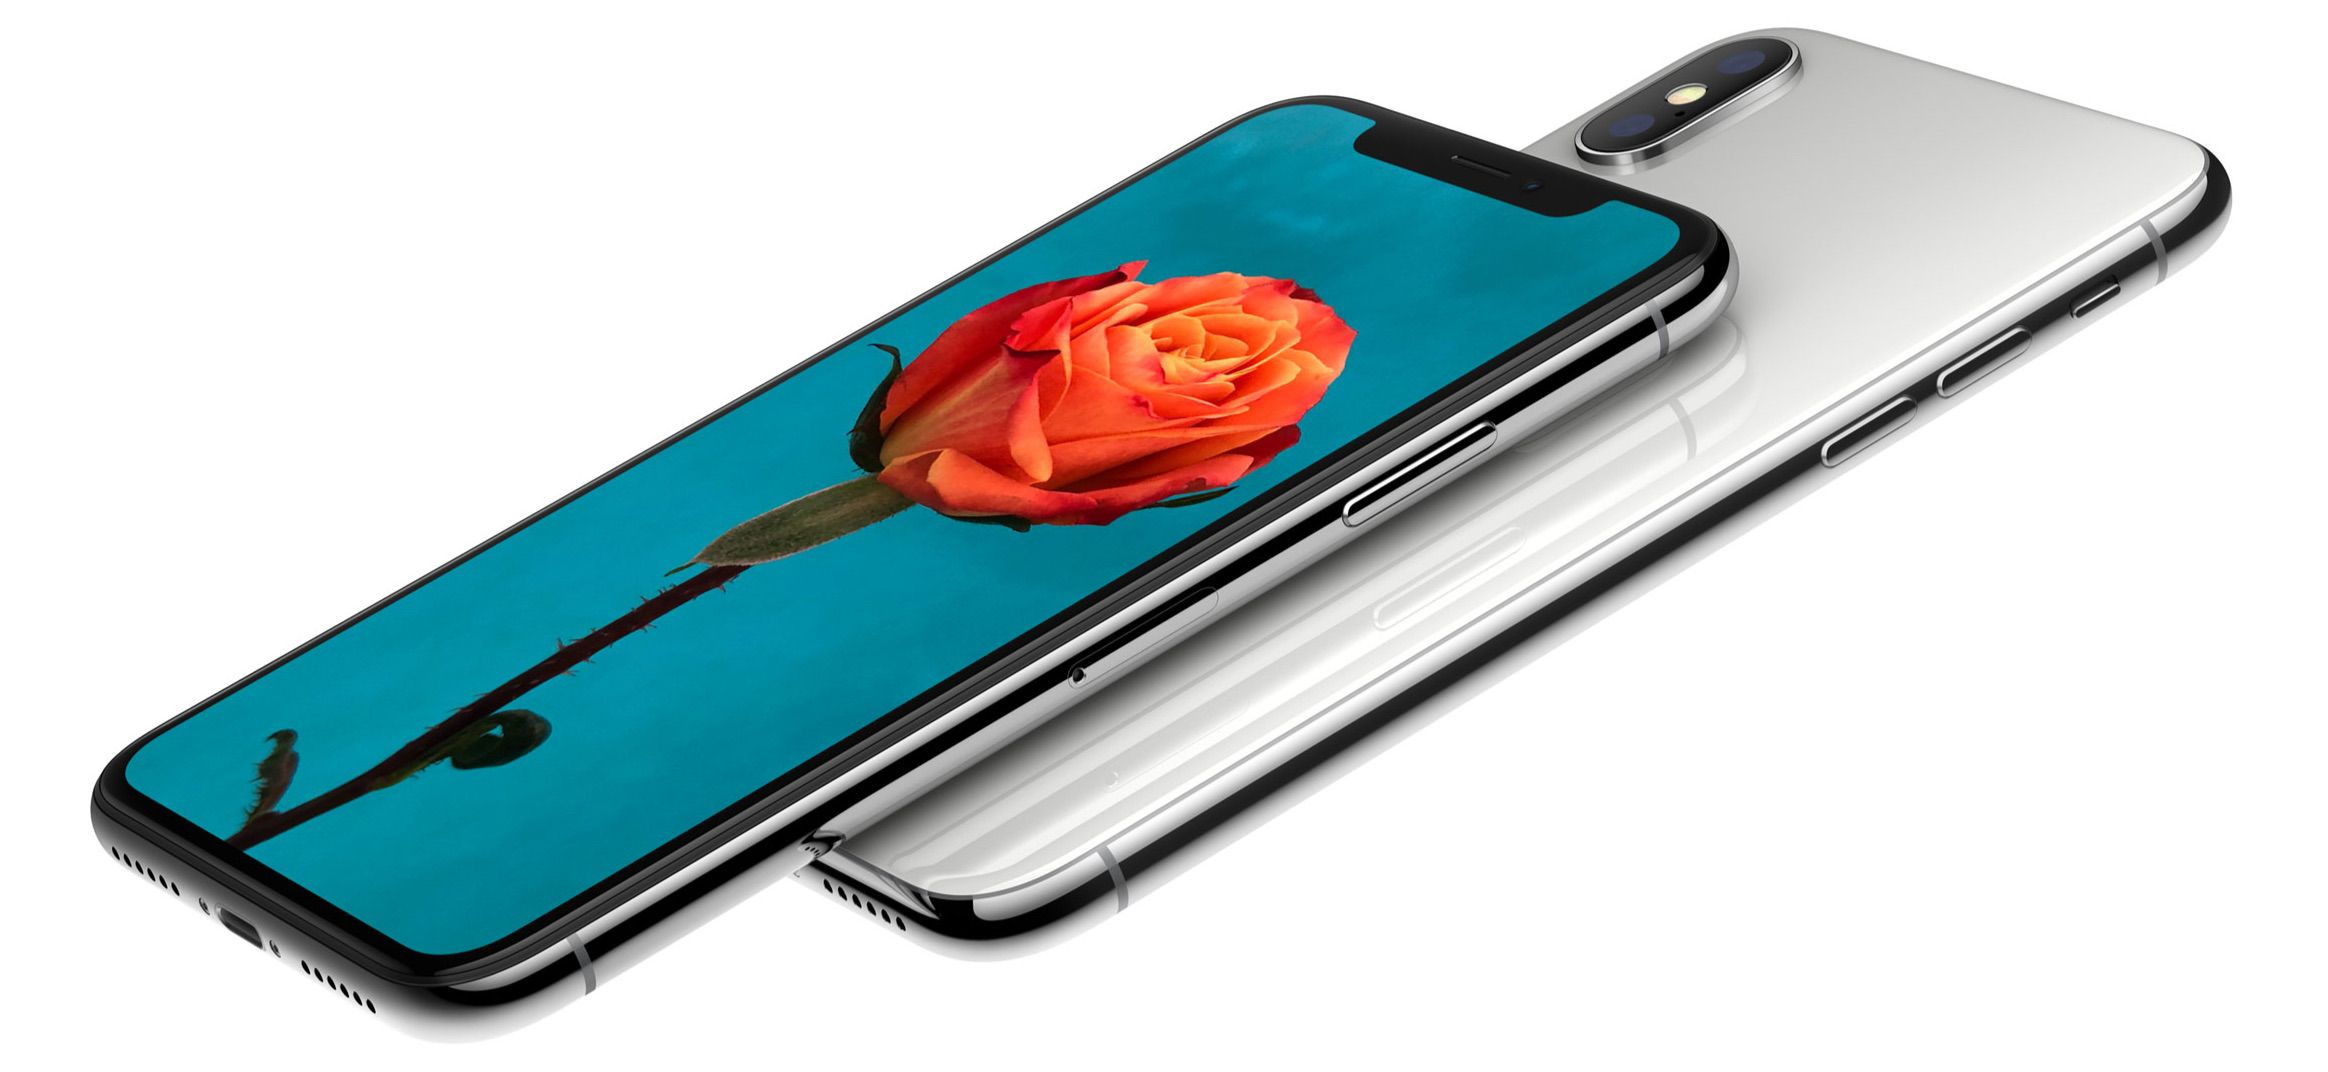 iPhone X: tutte le offerte di Vodafone, TIM, Tre e Wind